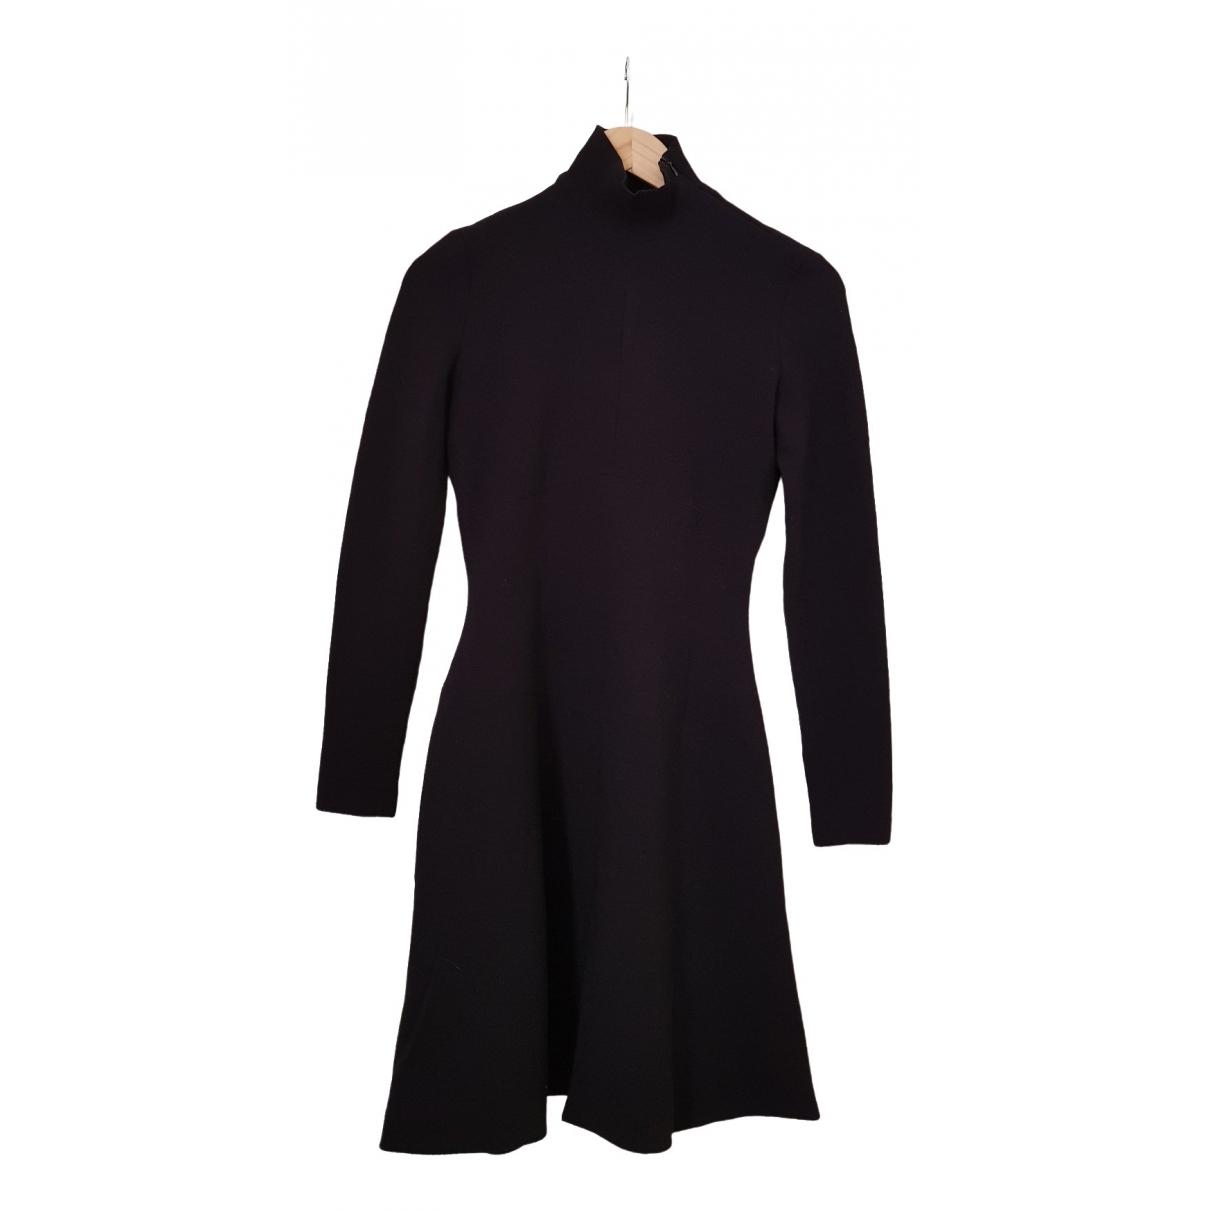 Chanel - Robe   pour femme en coton - elasthane - noir